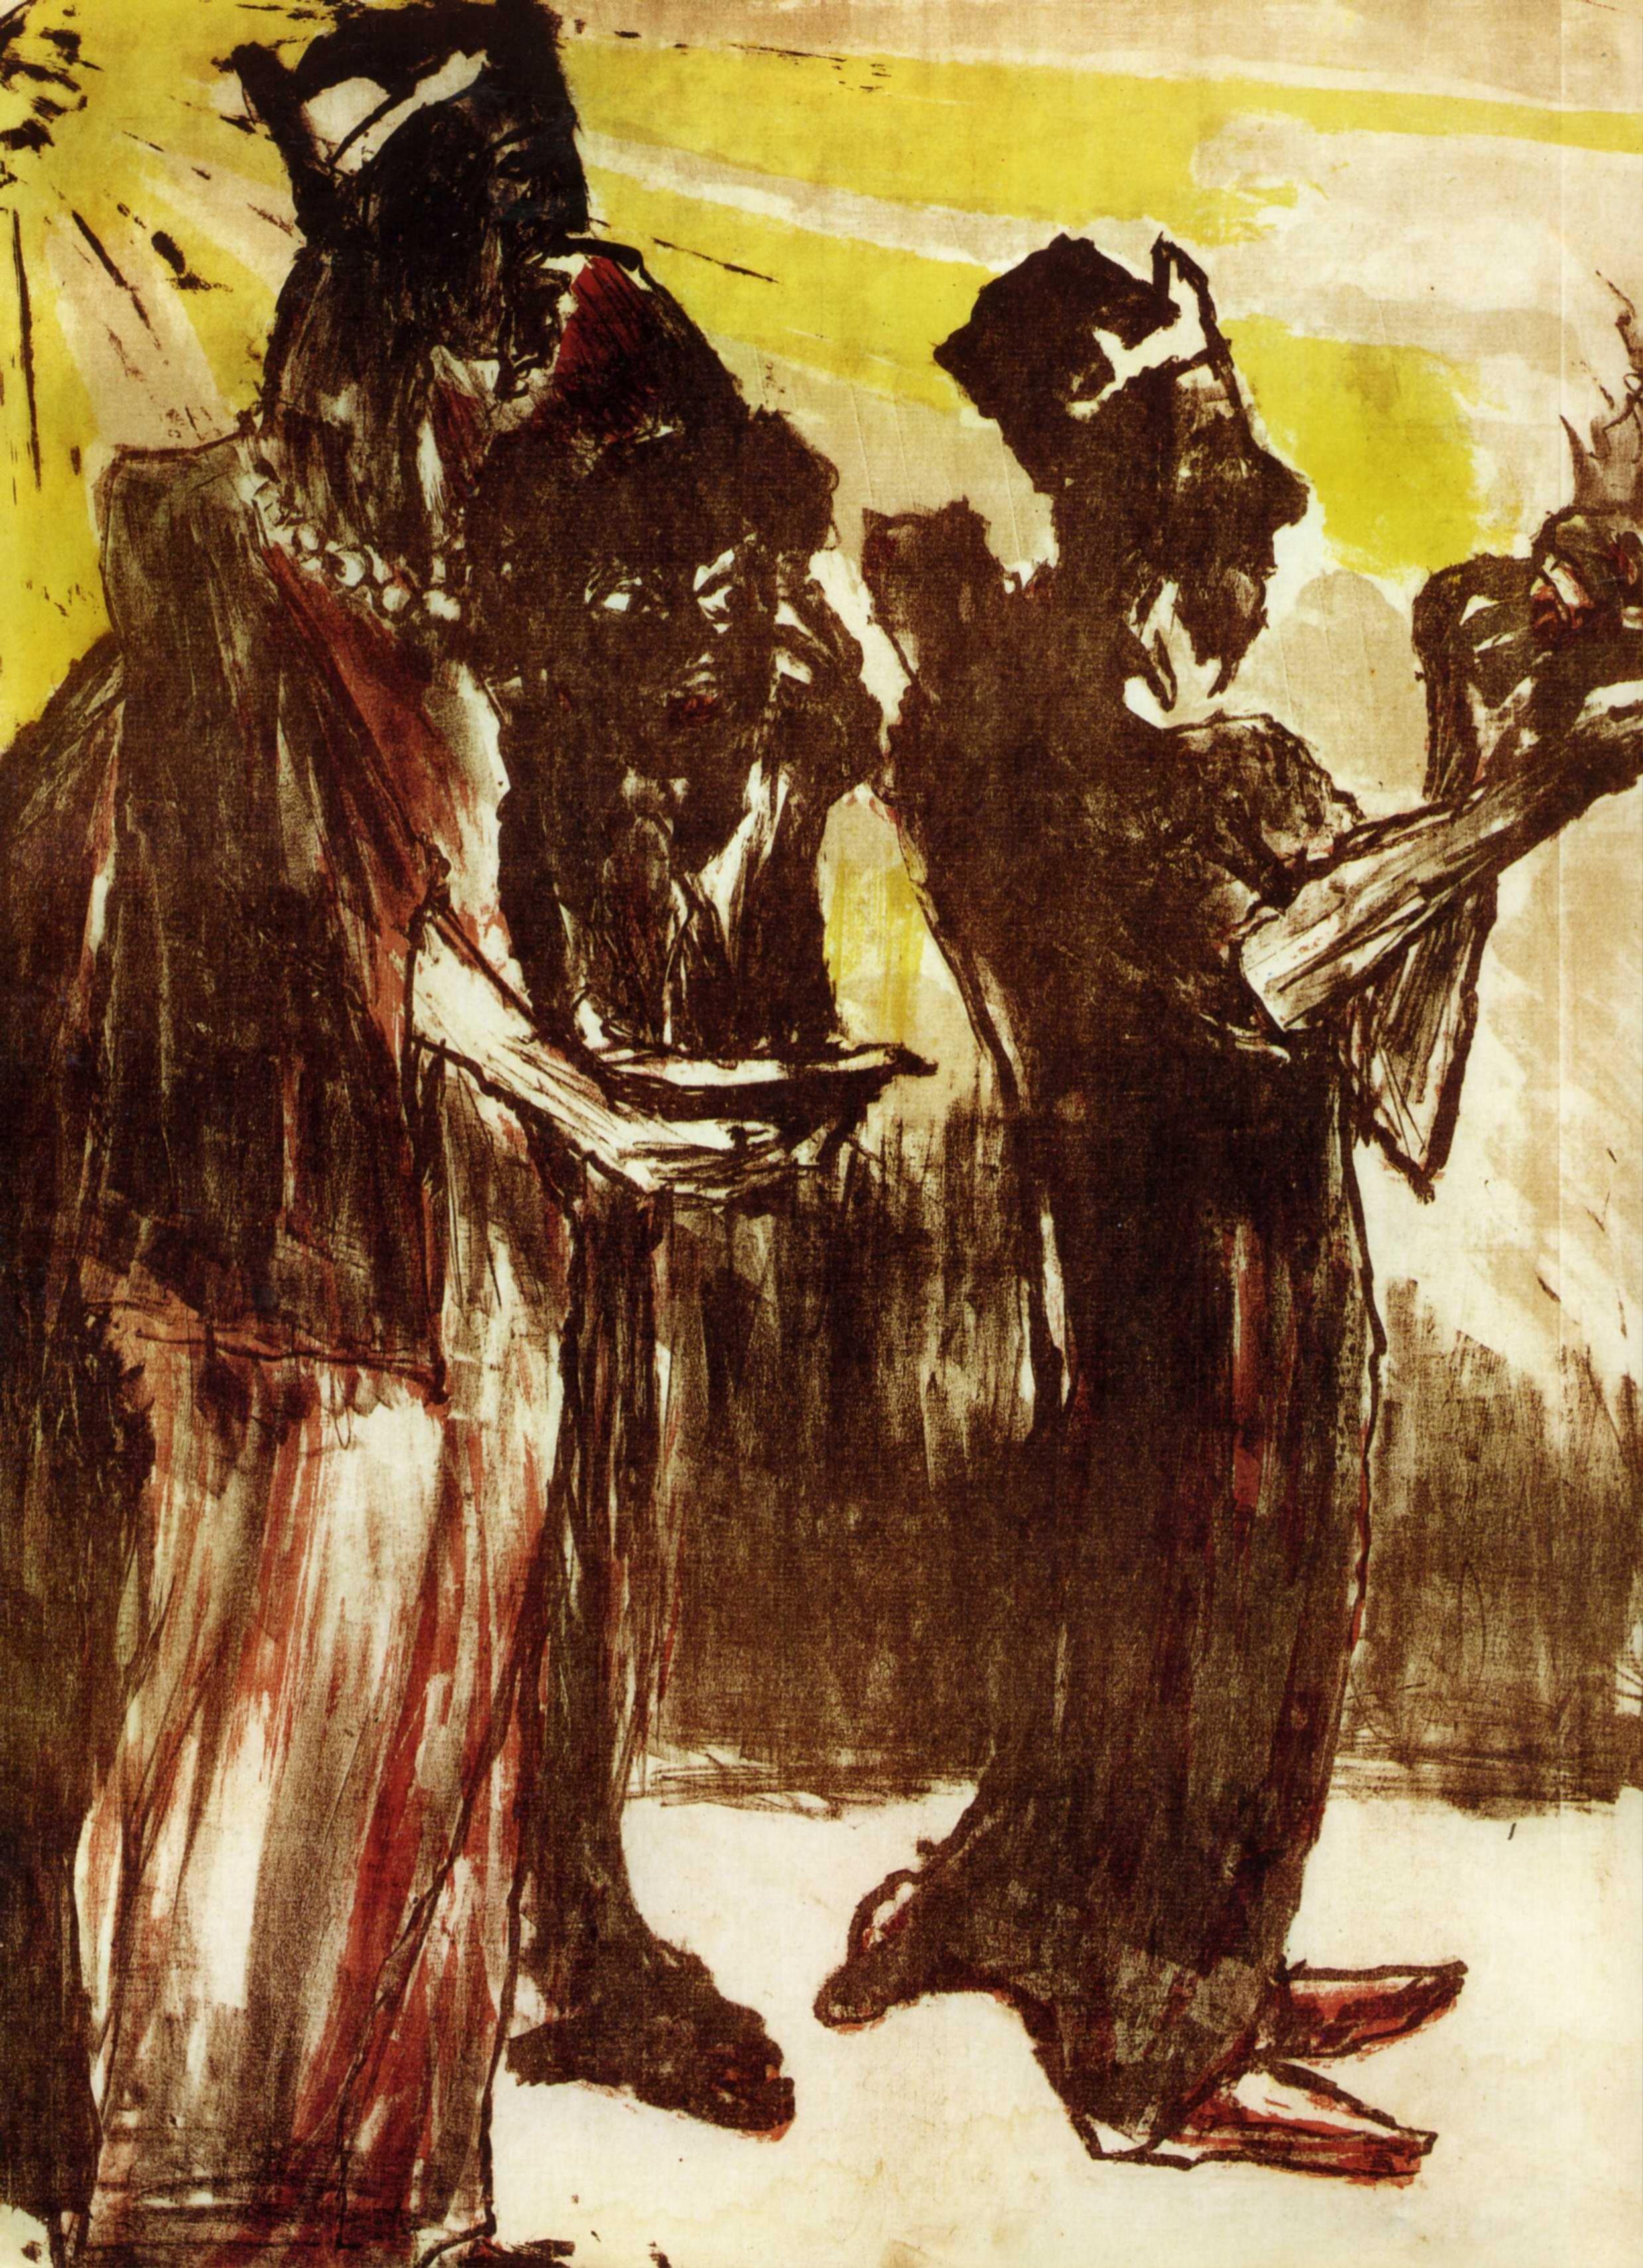 1913 Emil Nolde - The three Magi